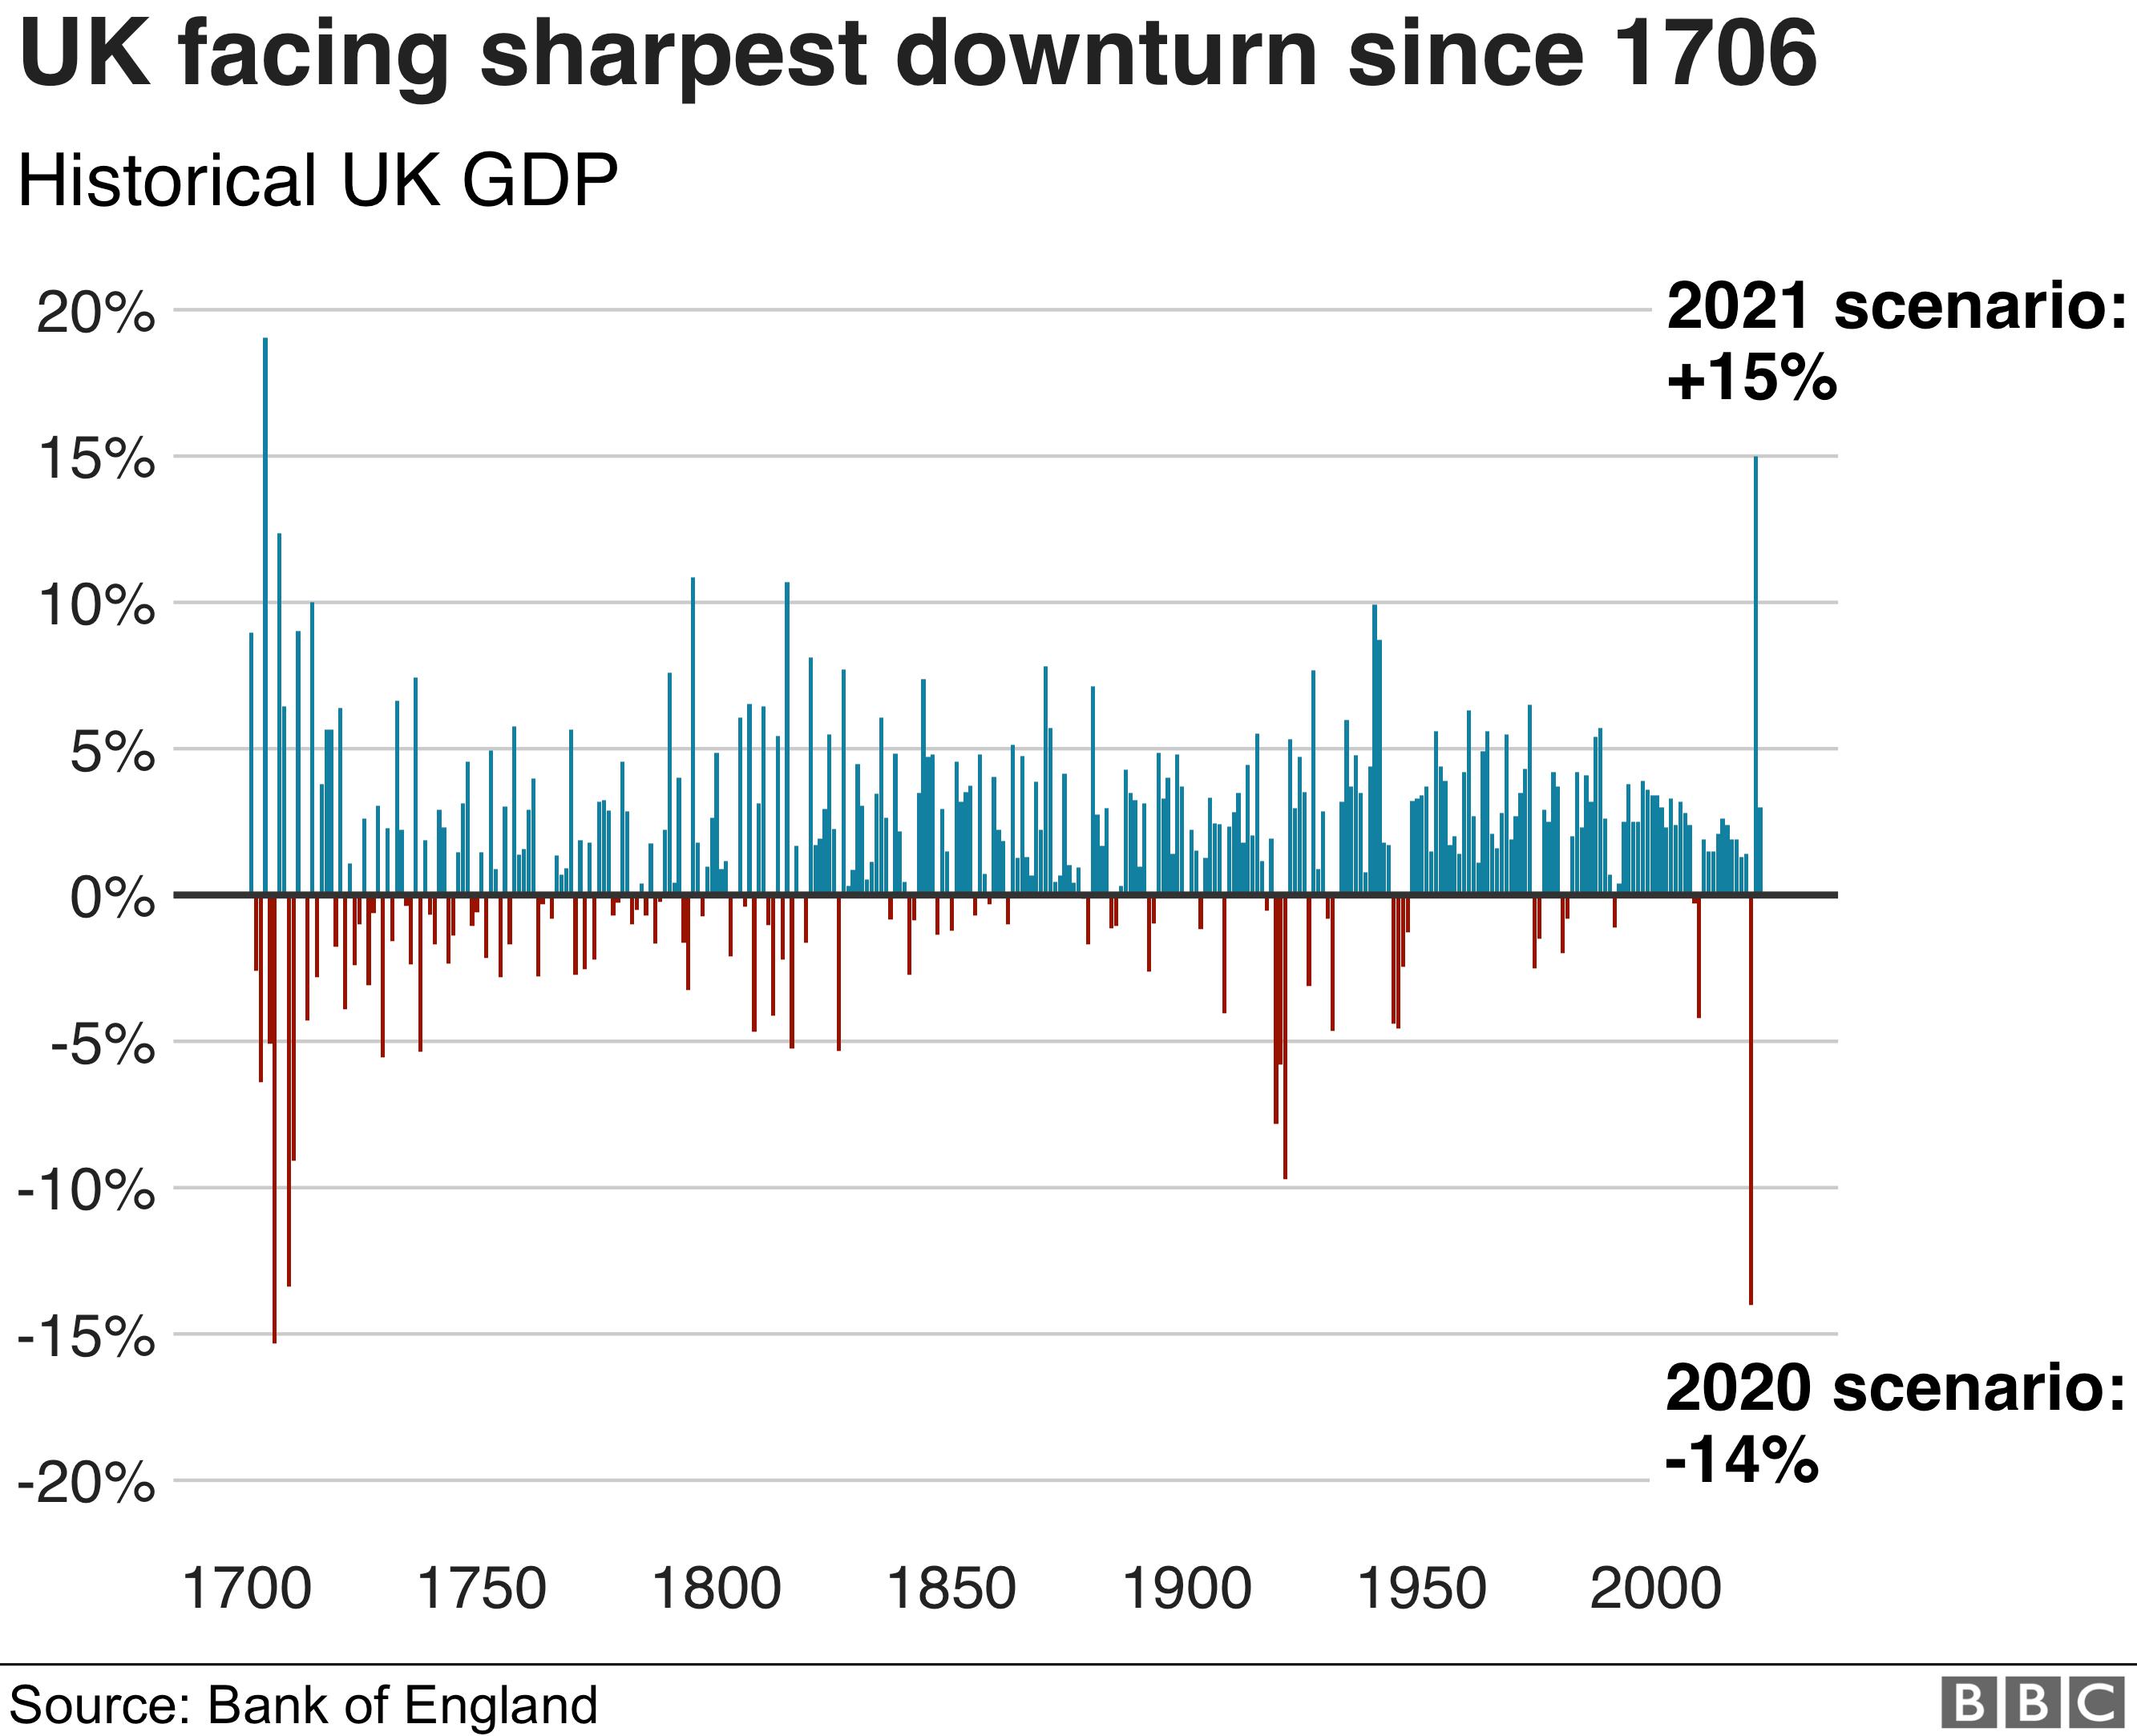 UK GDP scenario on course for an unprecedented decline